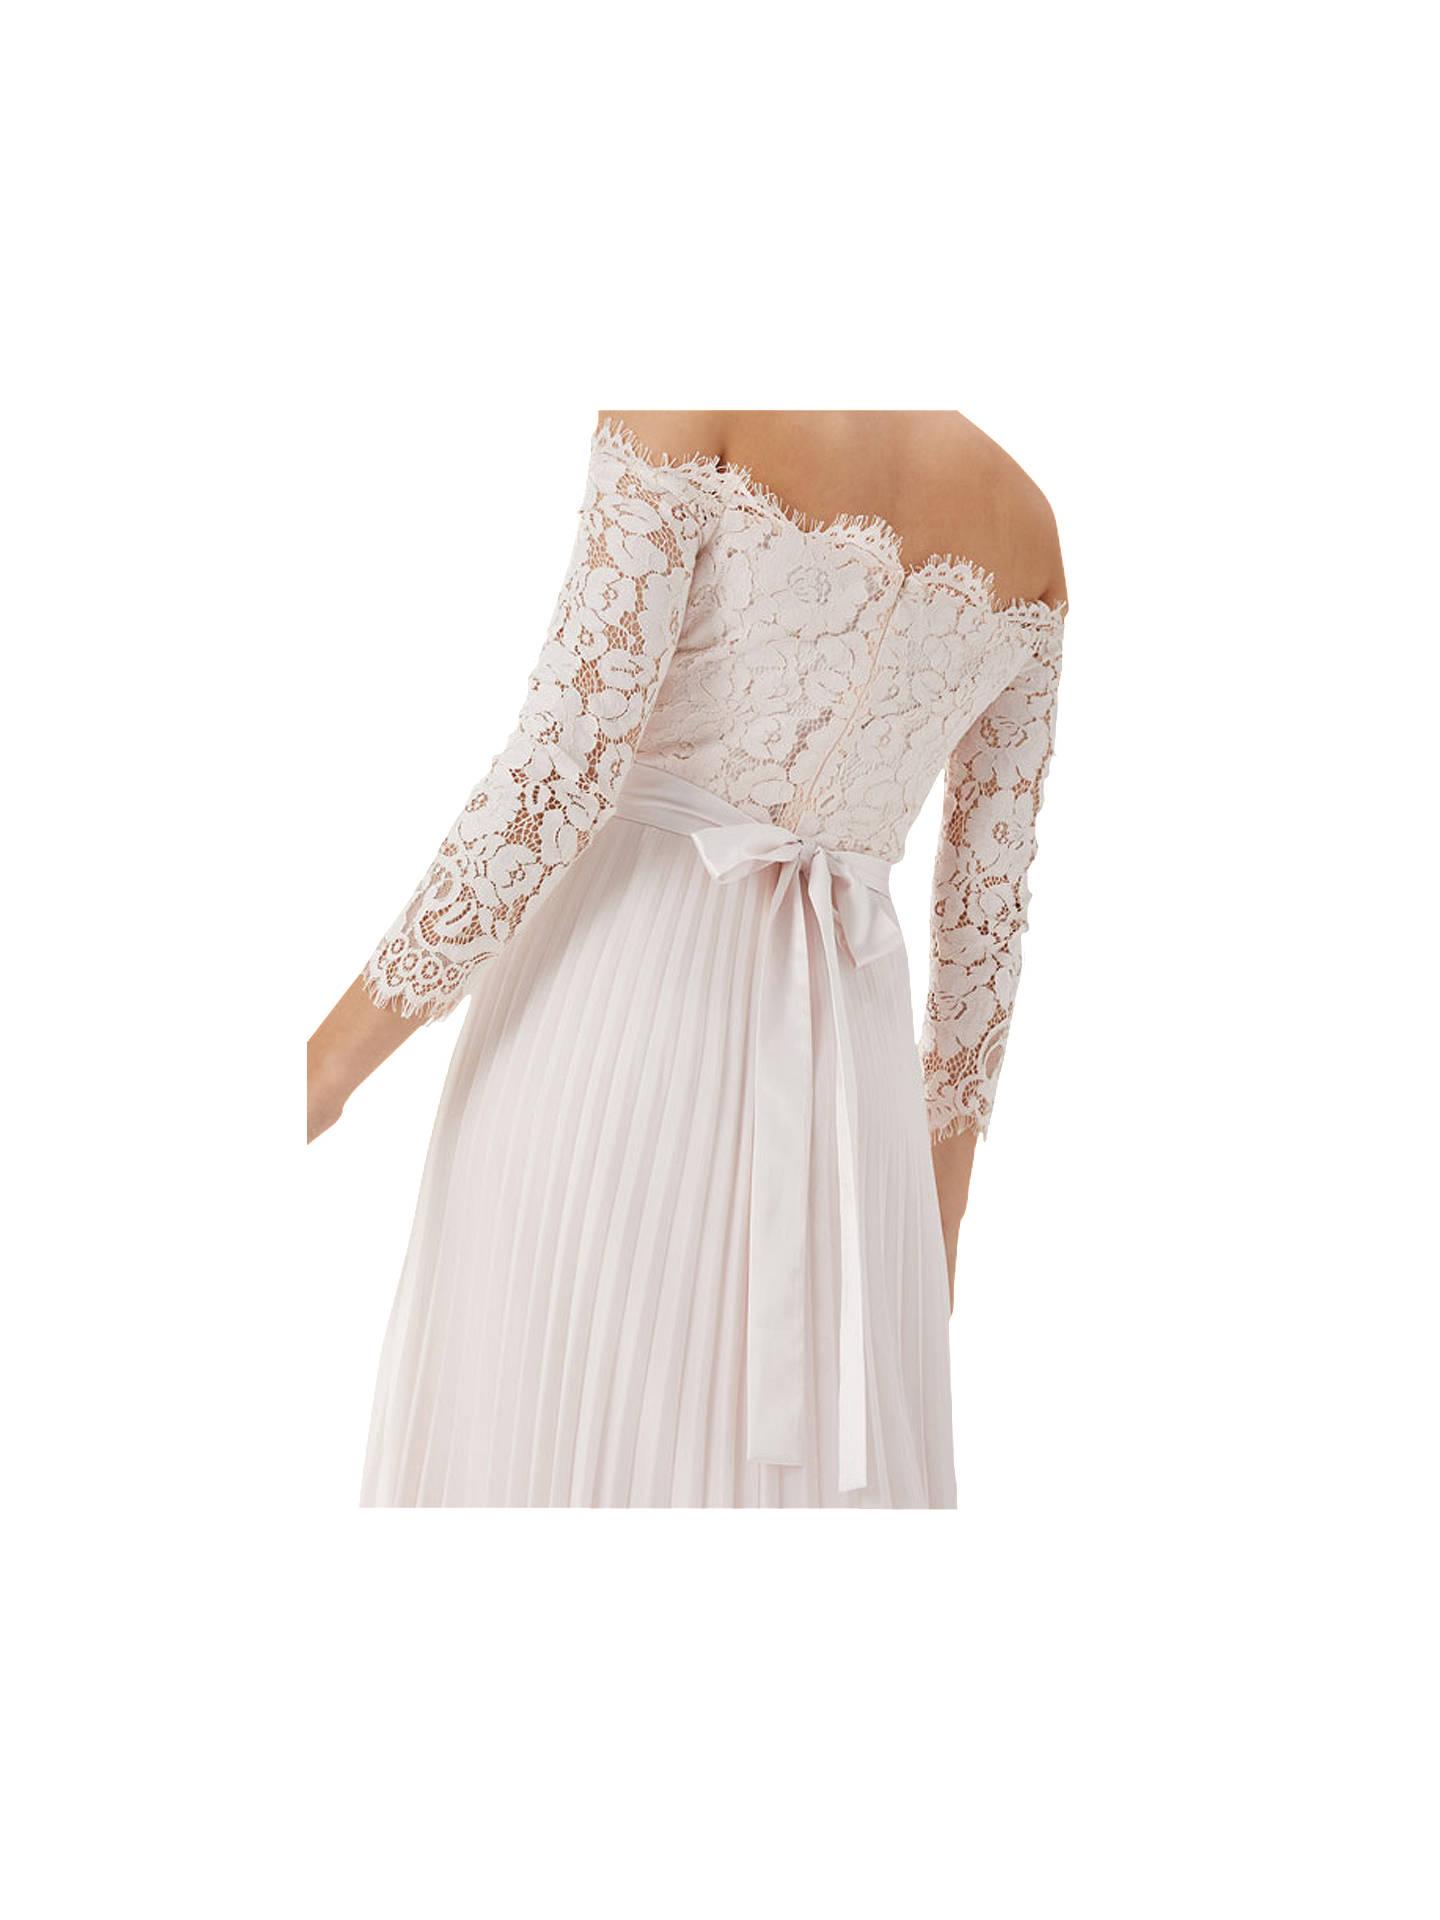 c85177d3cb920 ... Buy Coast Imi Lace Maxi Dress, Blush, 26 Online at johnlewis.com